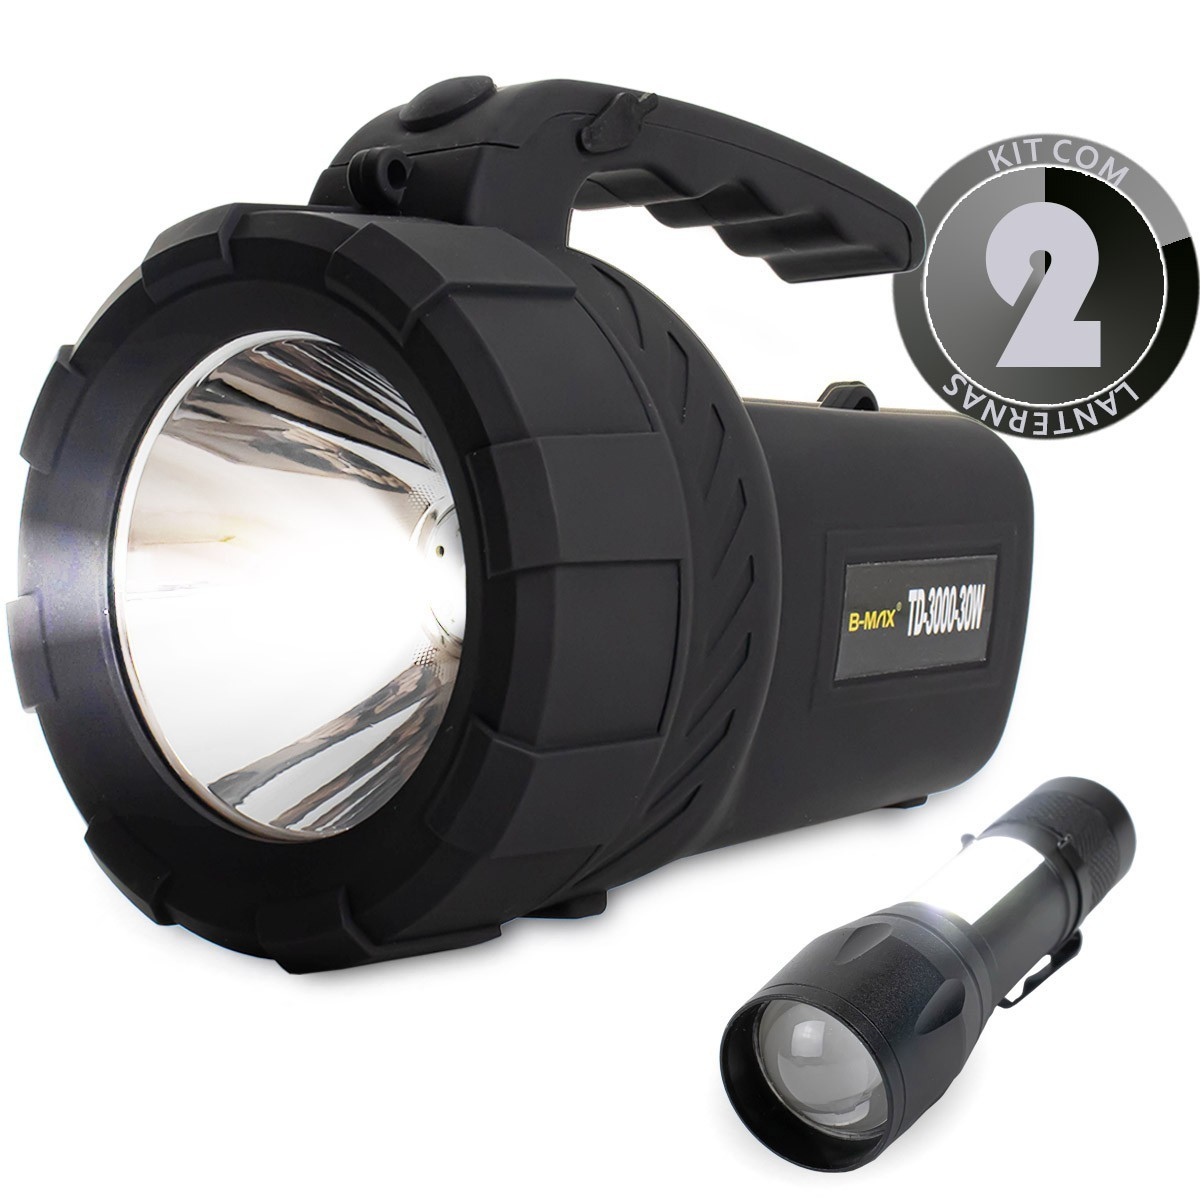 KIT Lanterna Led Holofote Recarregável TD-3000-30W + Mini Lanterna Tática Compacta BM8400